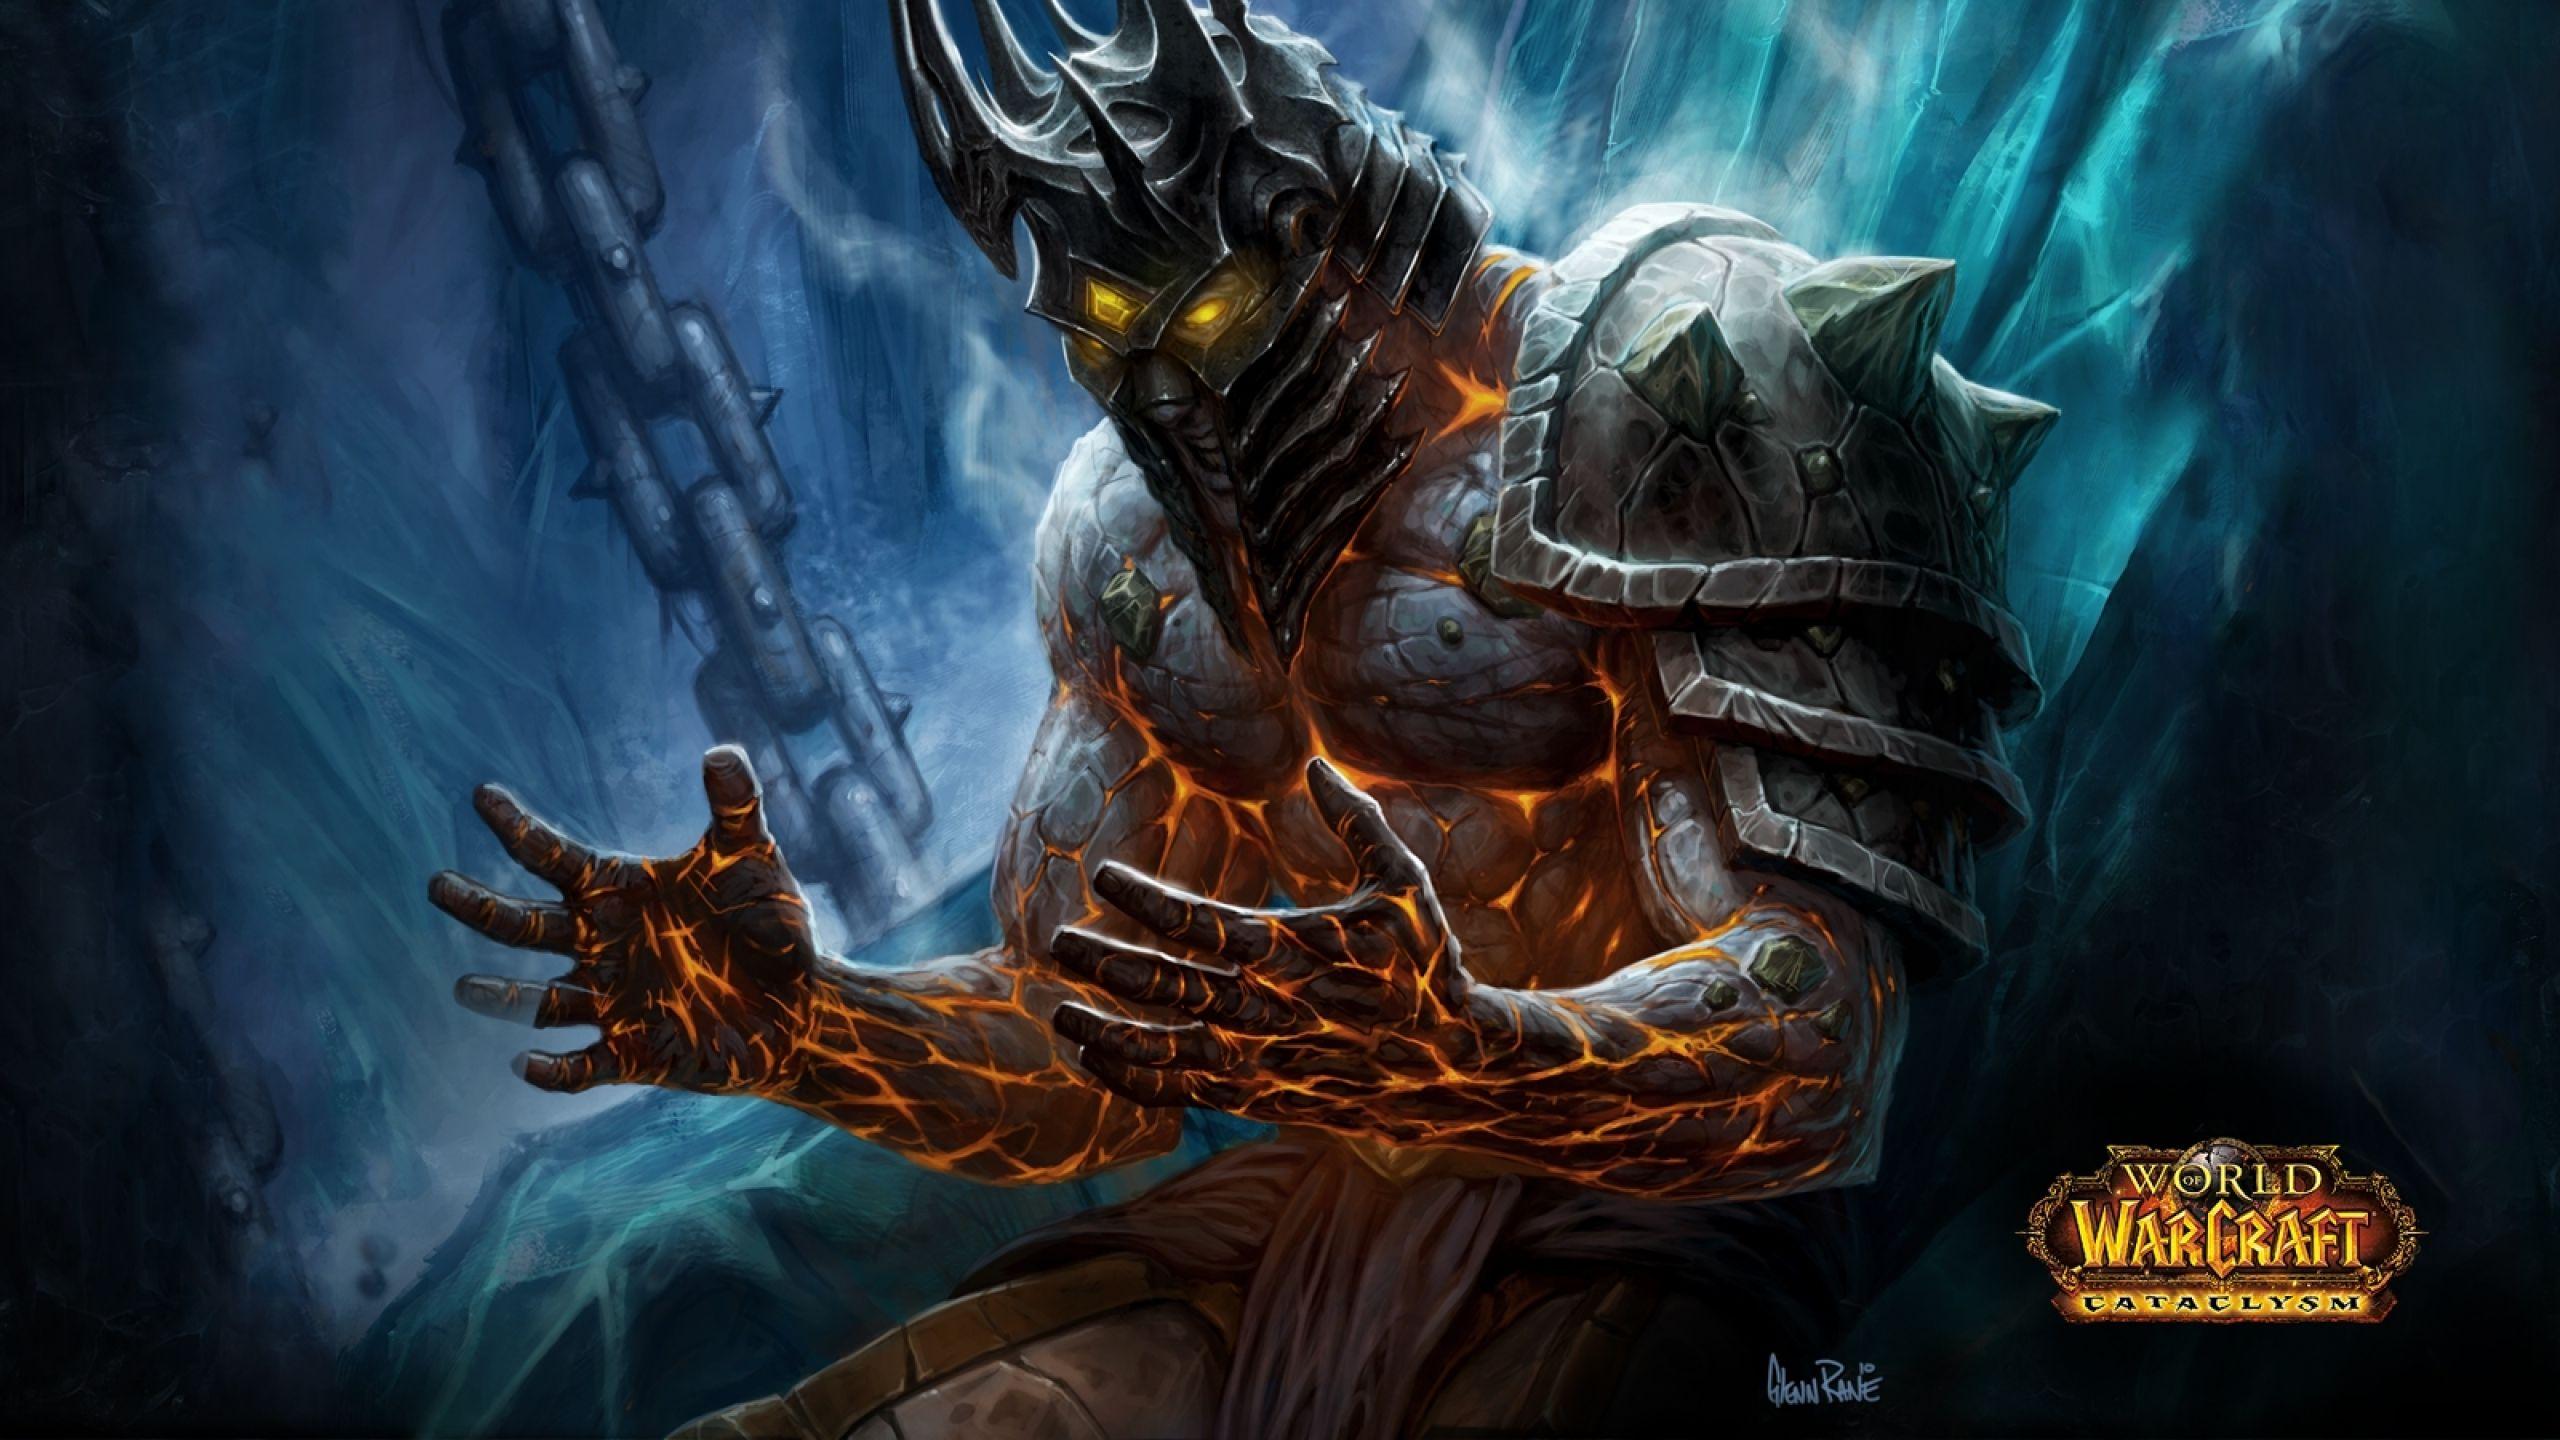 48 World Of Warcraft Wallpaper 2560x1440 On Wallpapersafari